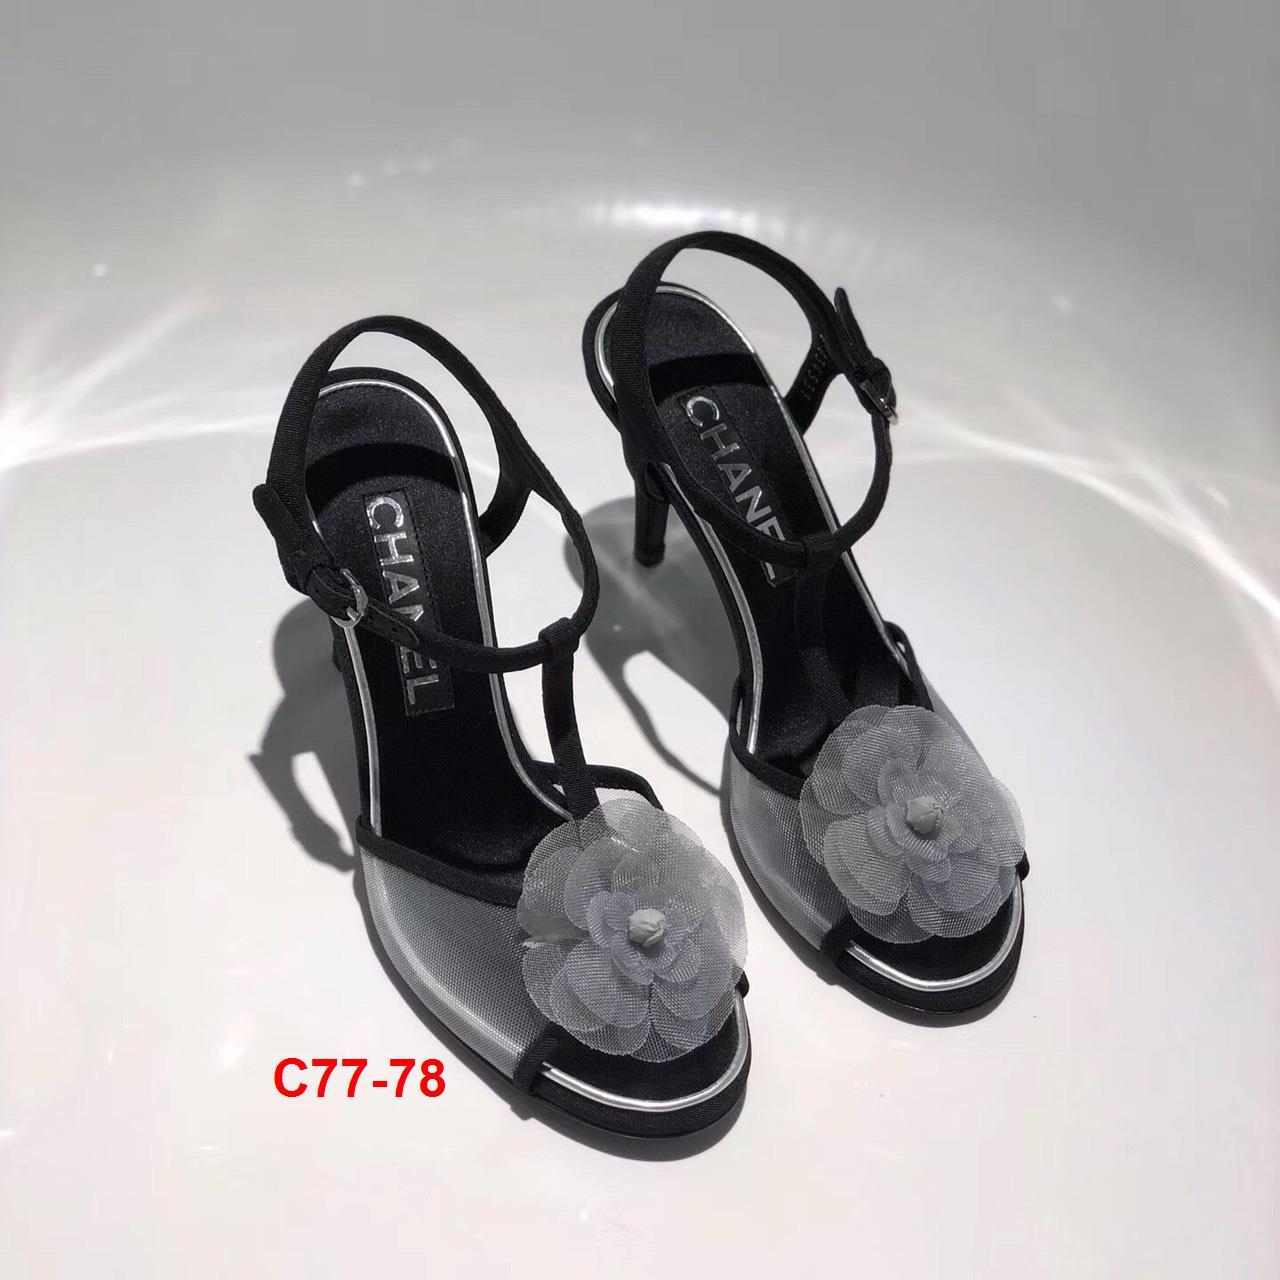 C77-78 Chanel sandal cao 8cm siêu cấp